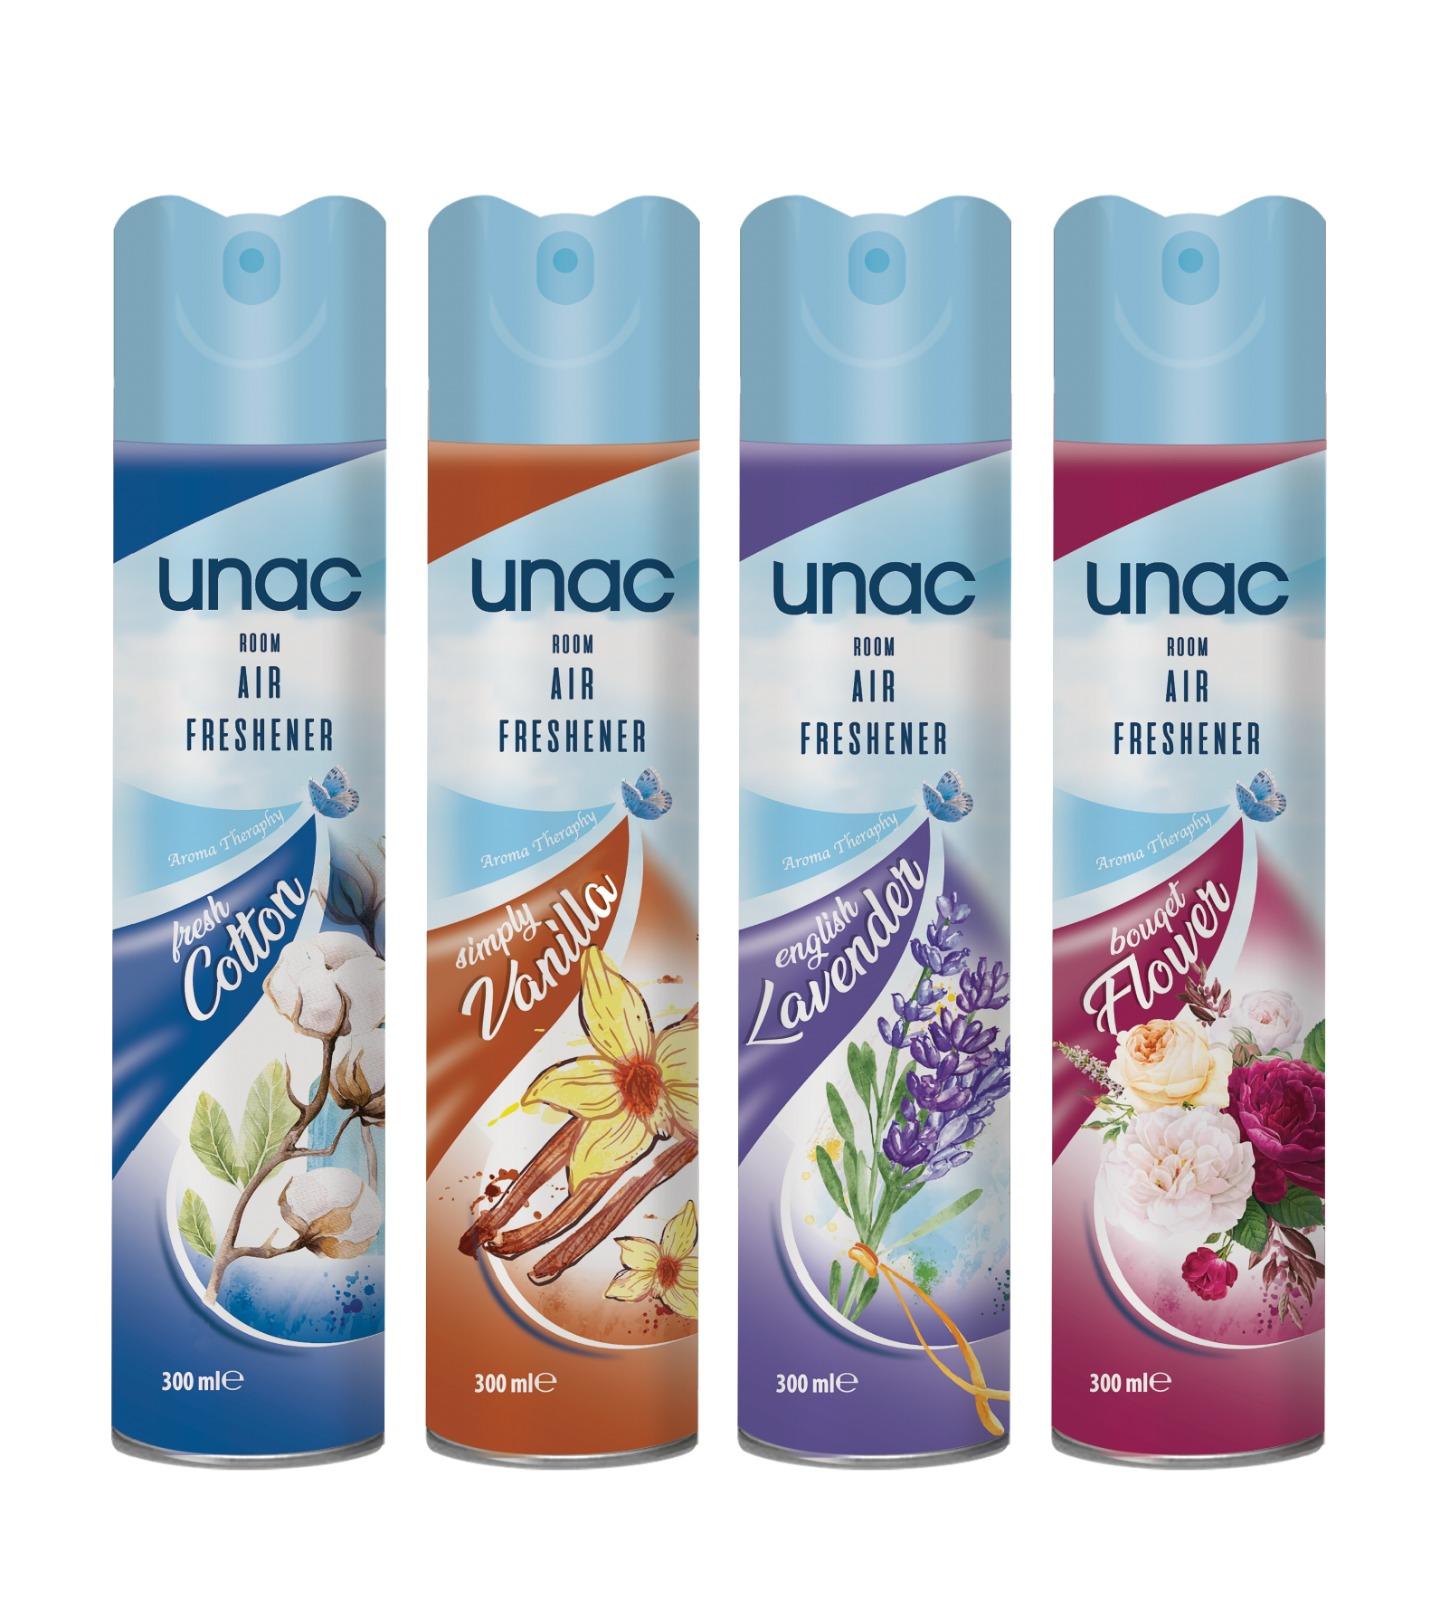 Unac Air Fresheners